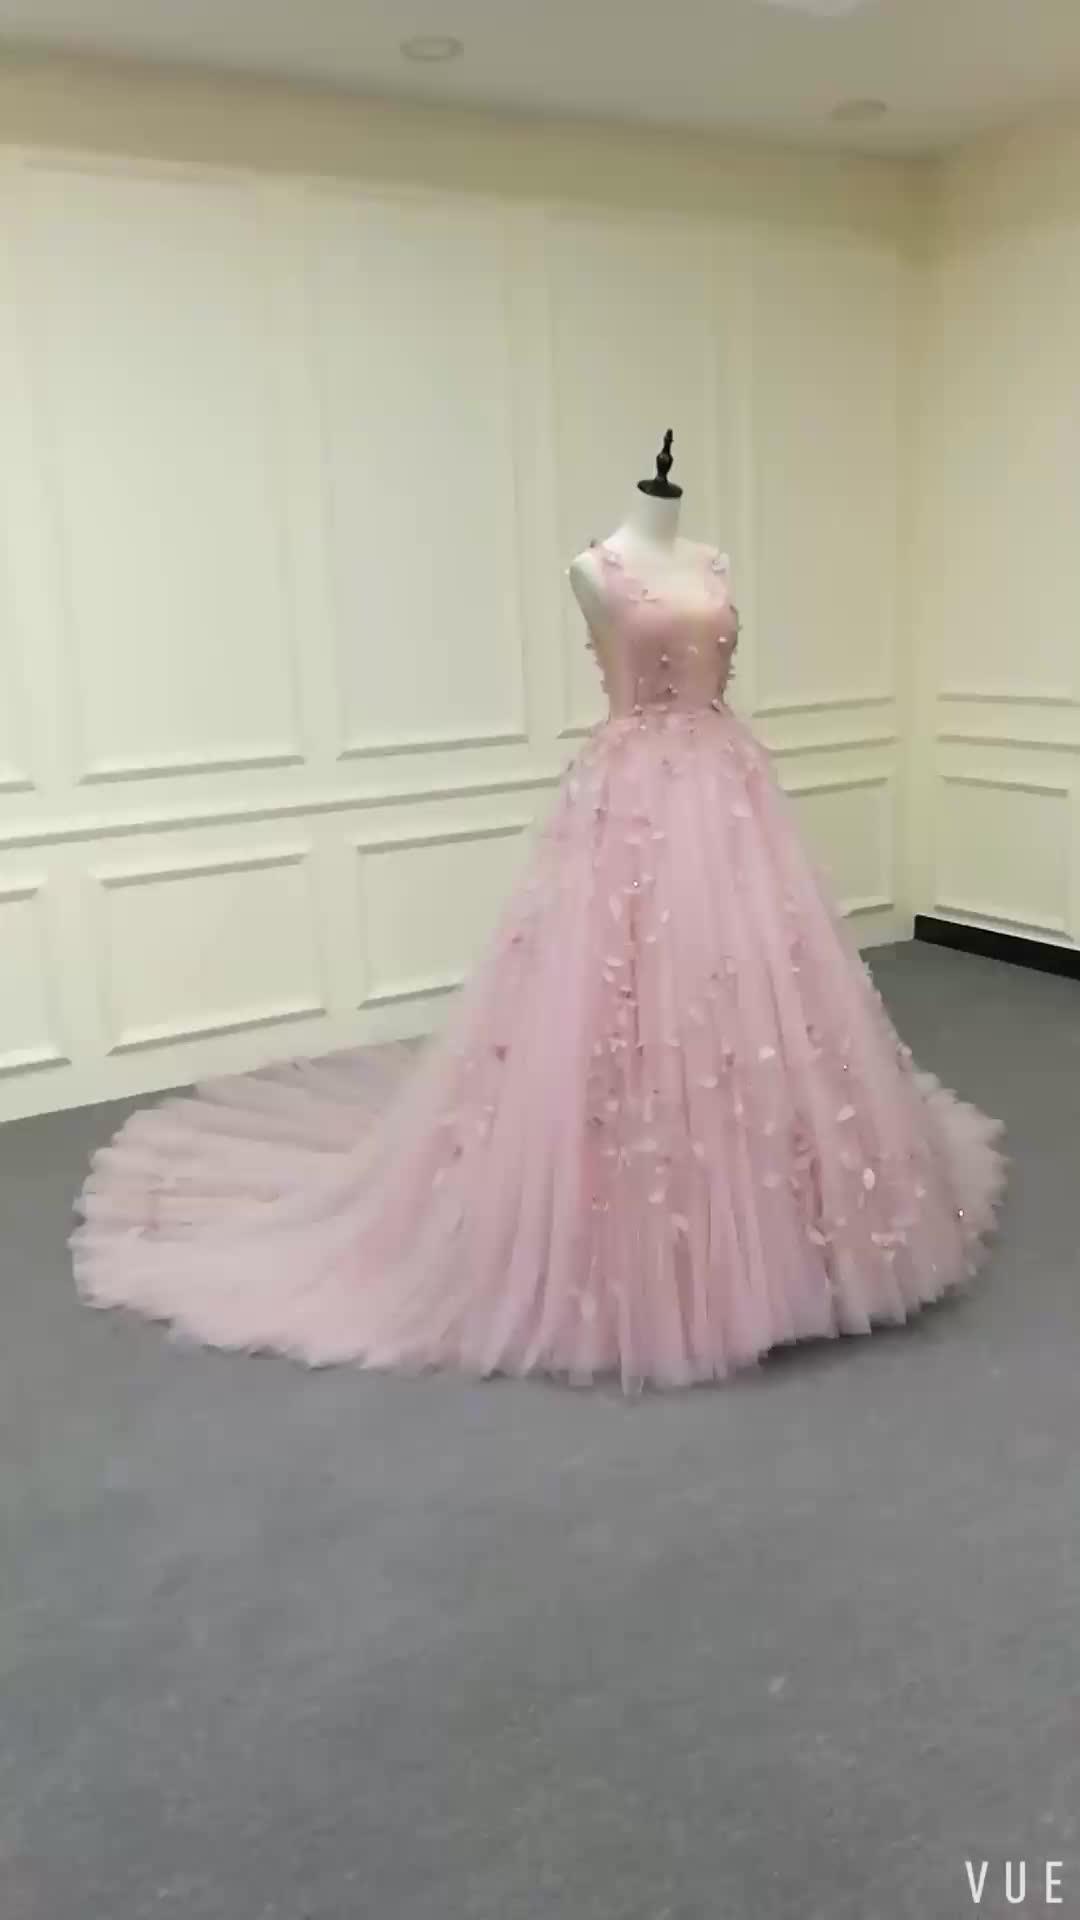 Libélula Enfeite Rosa Tulle Lace A Linha de Vestido Longo de Noite Formal Pageant vestido de Baile